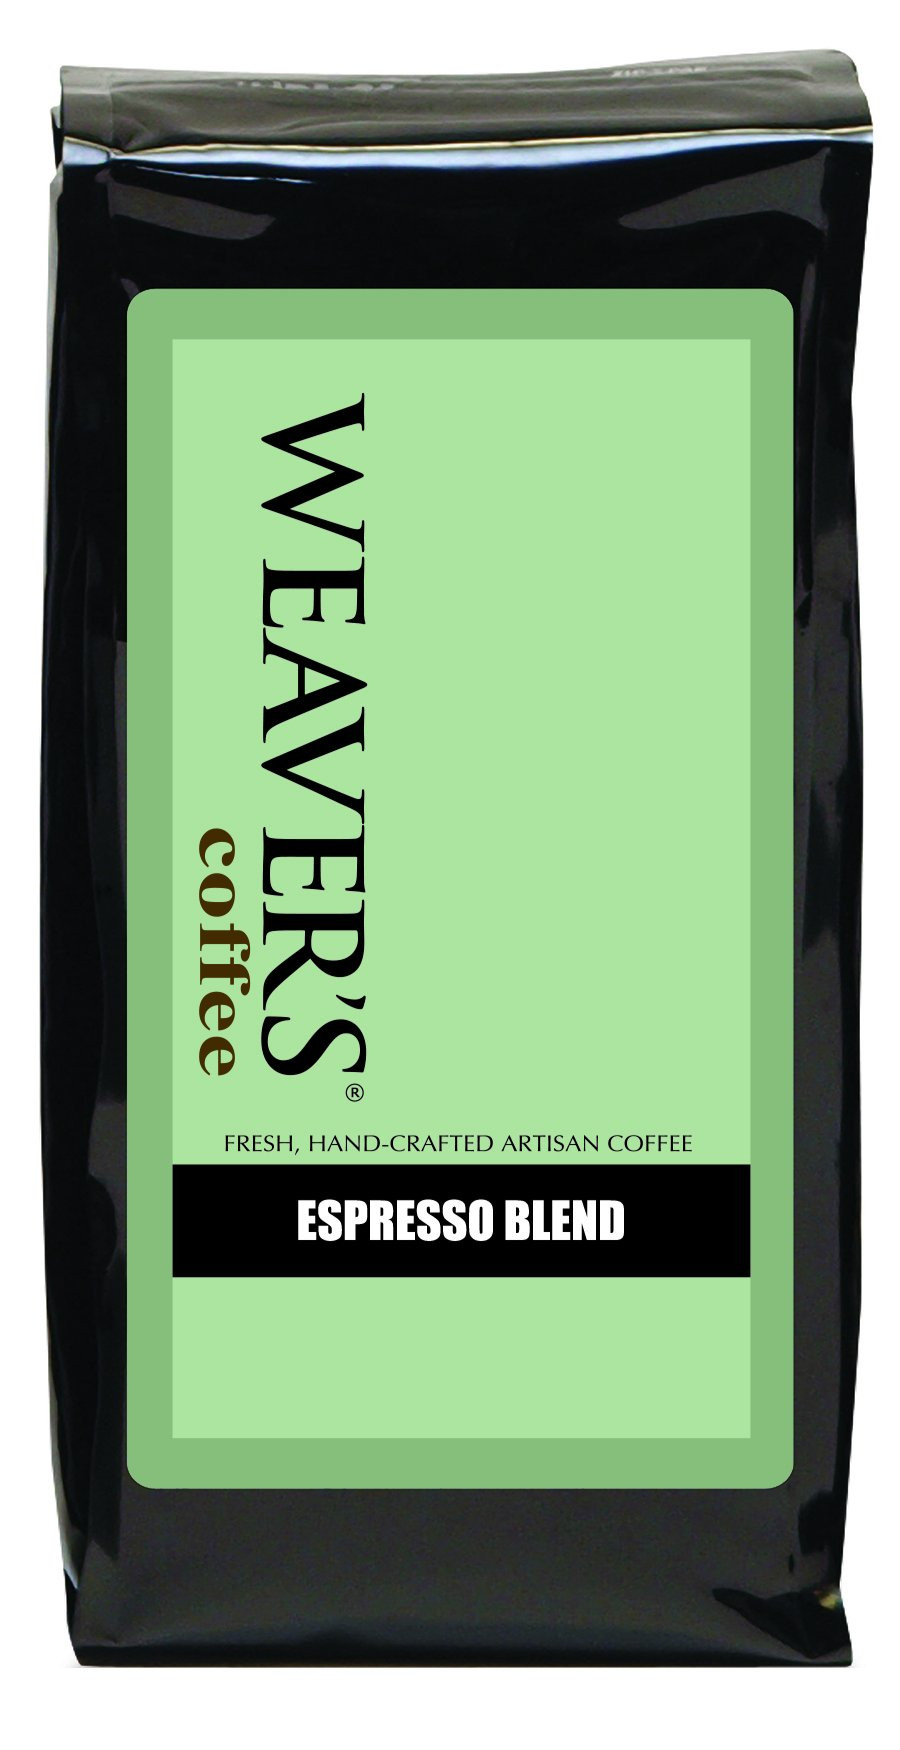 Weaver's Coffee Espresso Blend